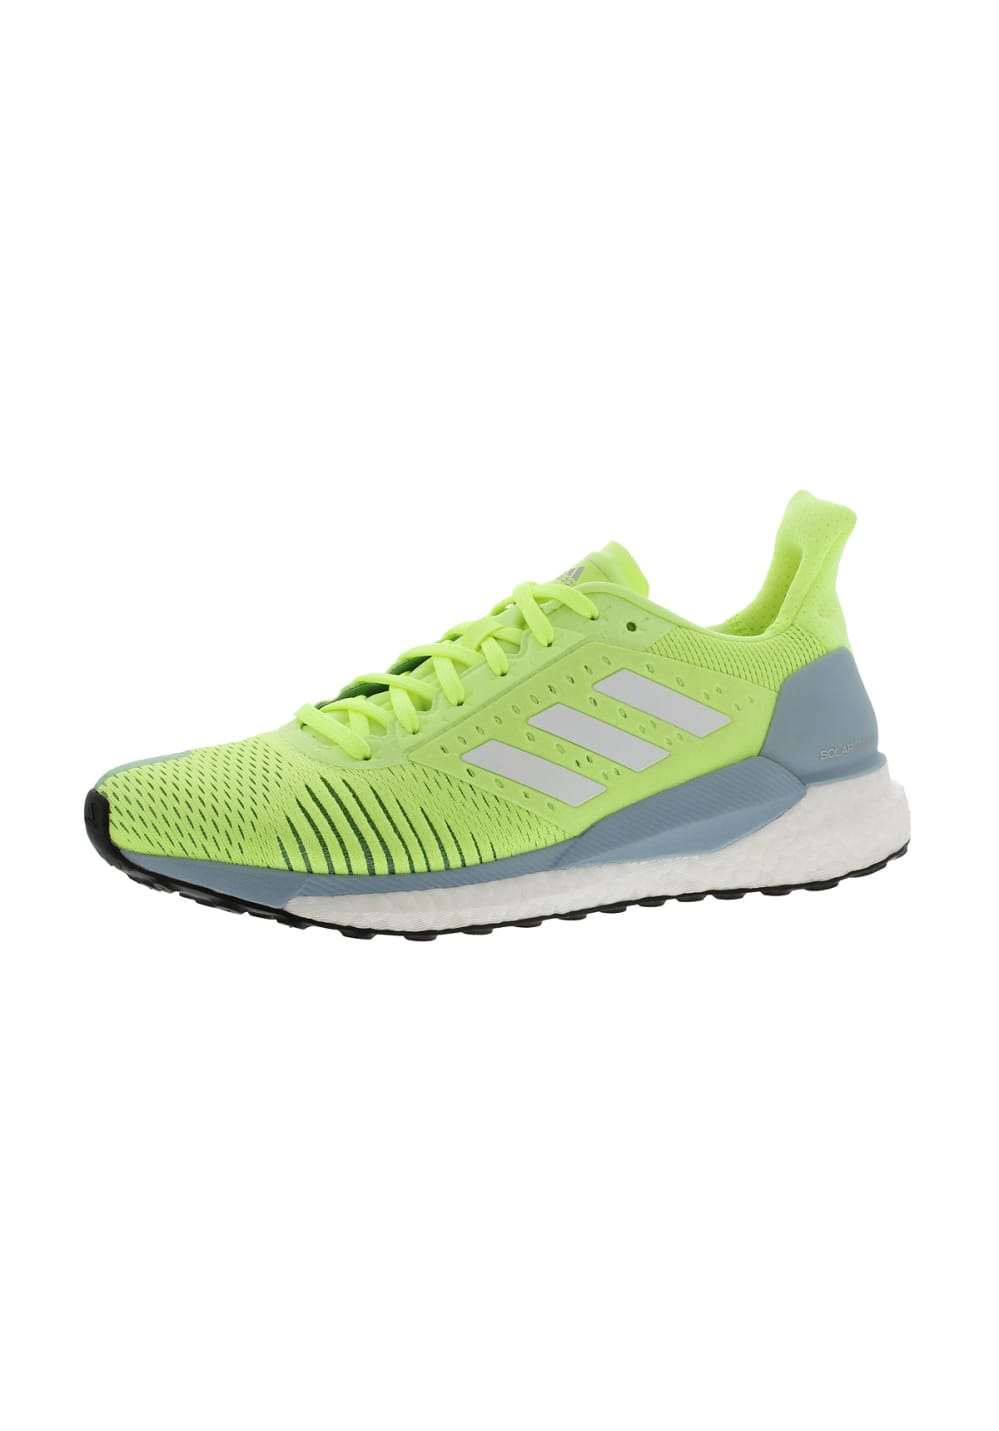 Glide De Para Adidas St Zapatillas Running Verde Mujer Solar c5RjqLA34